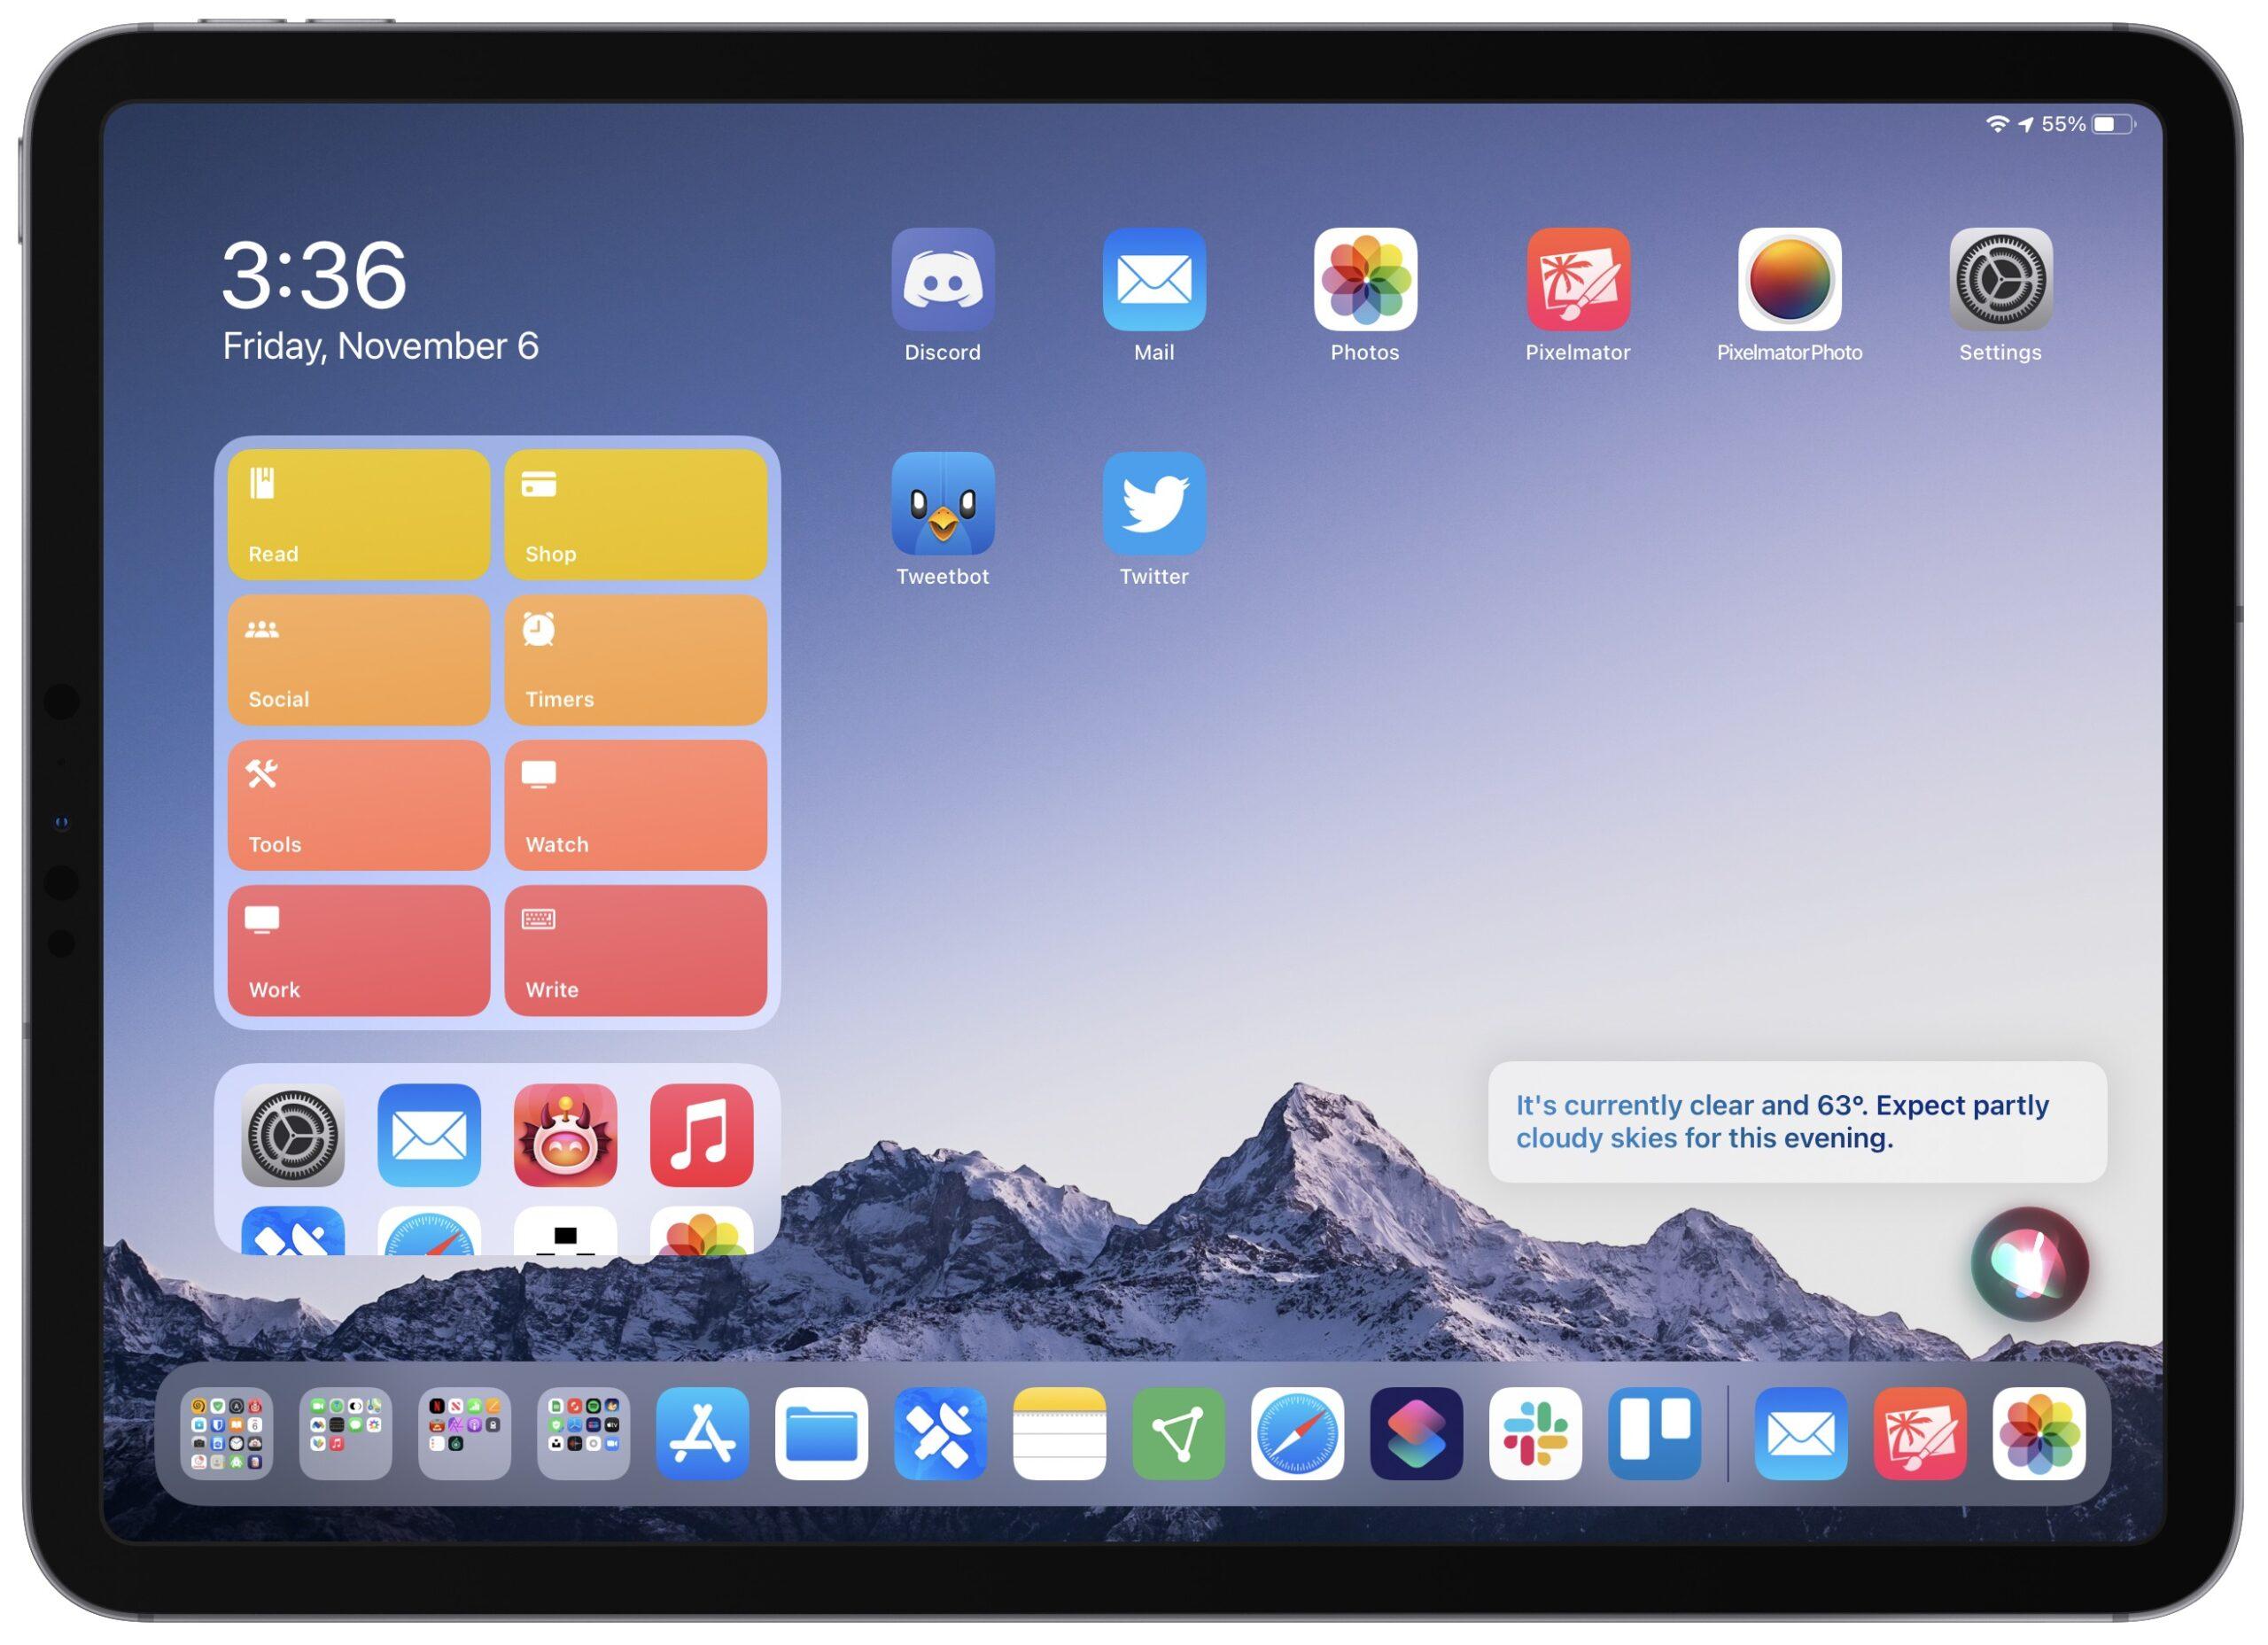 Siri personalized update on iPad